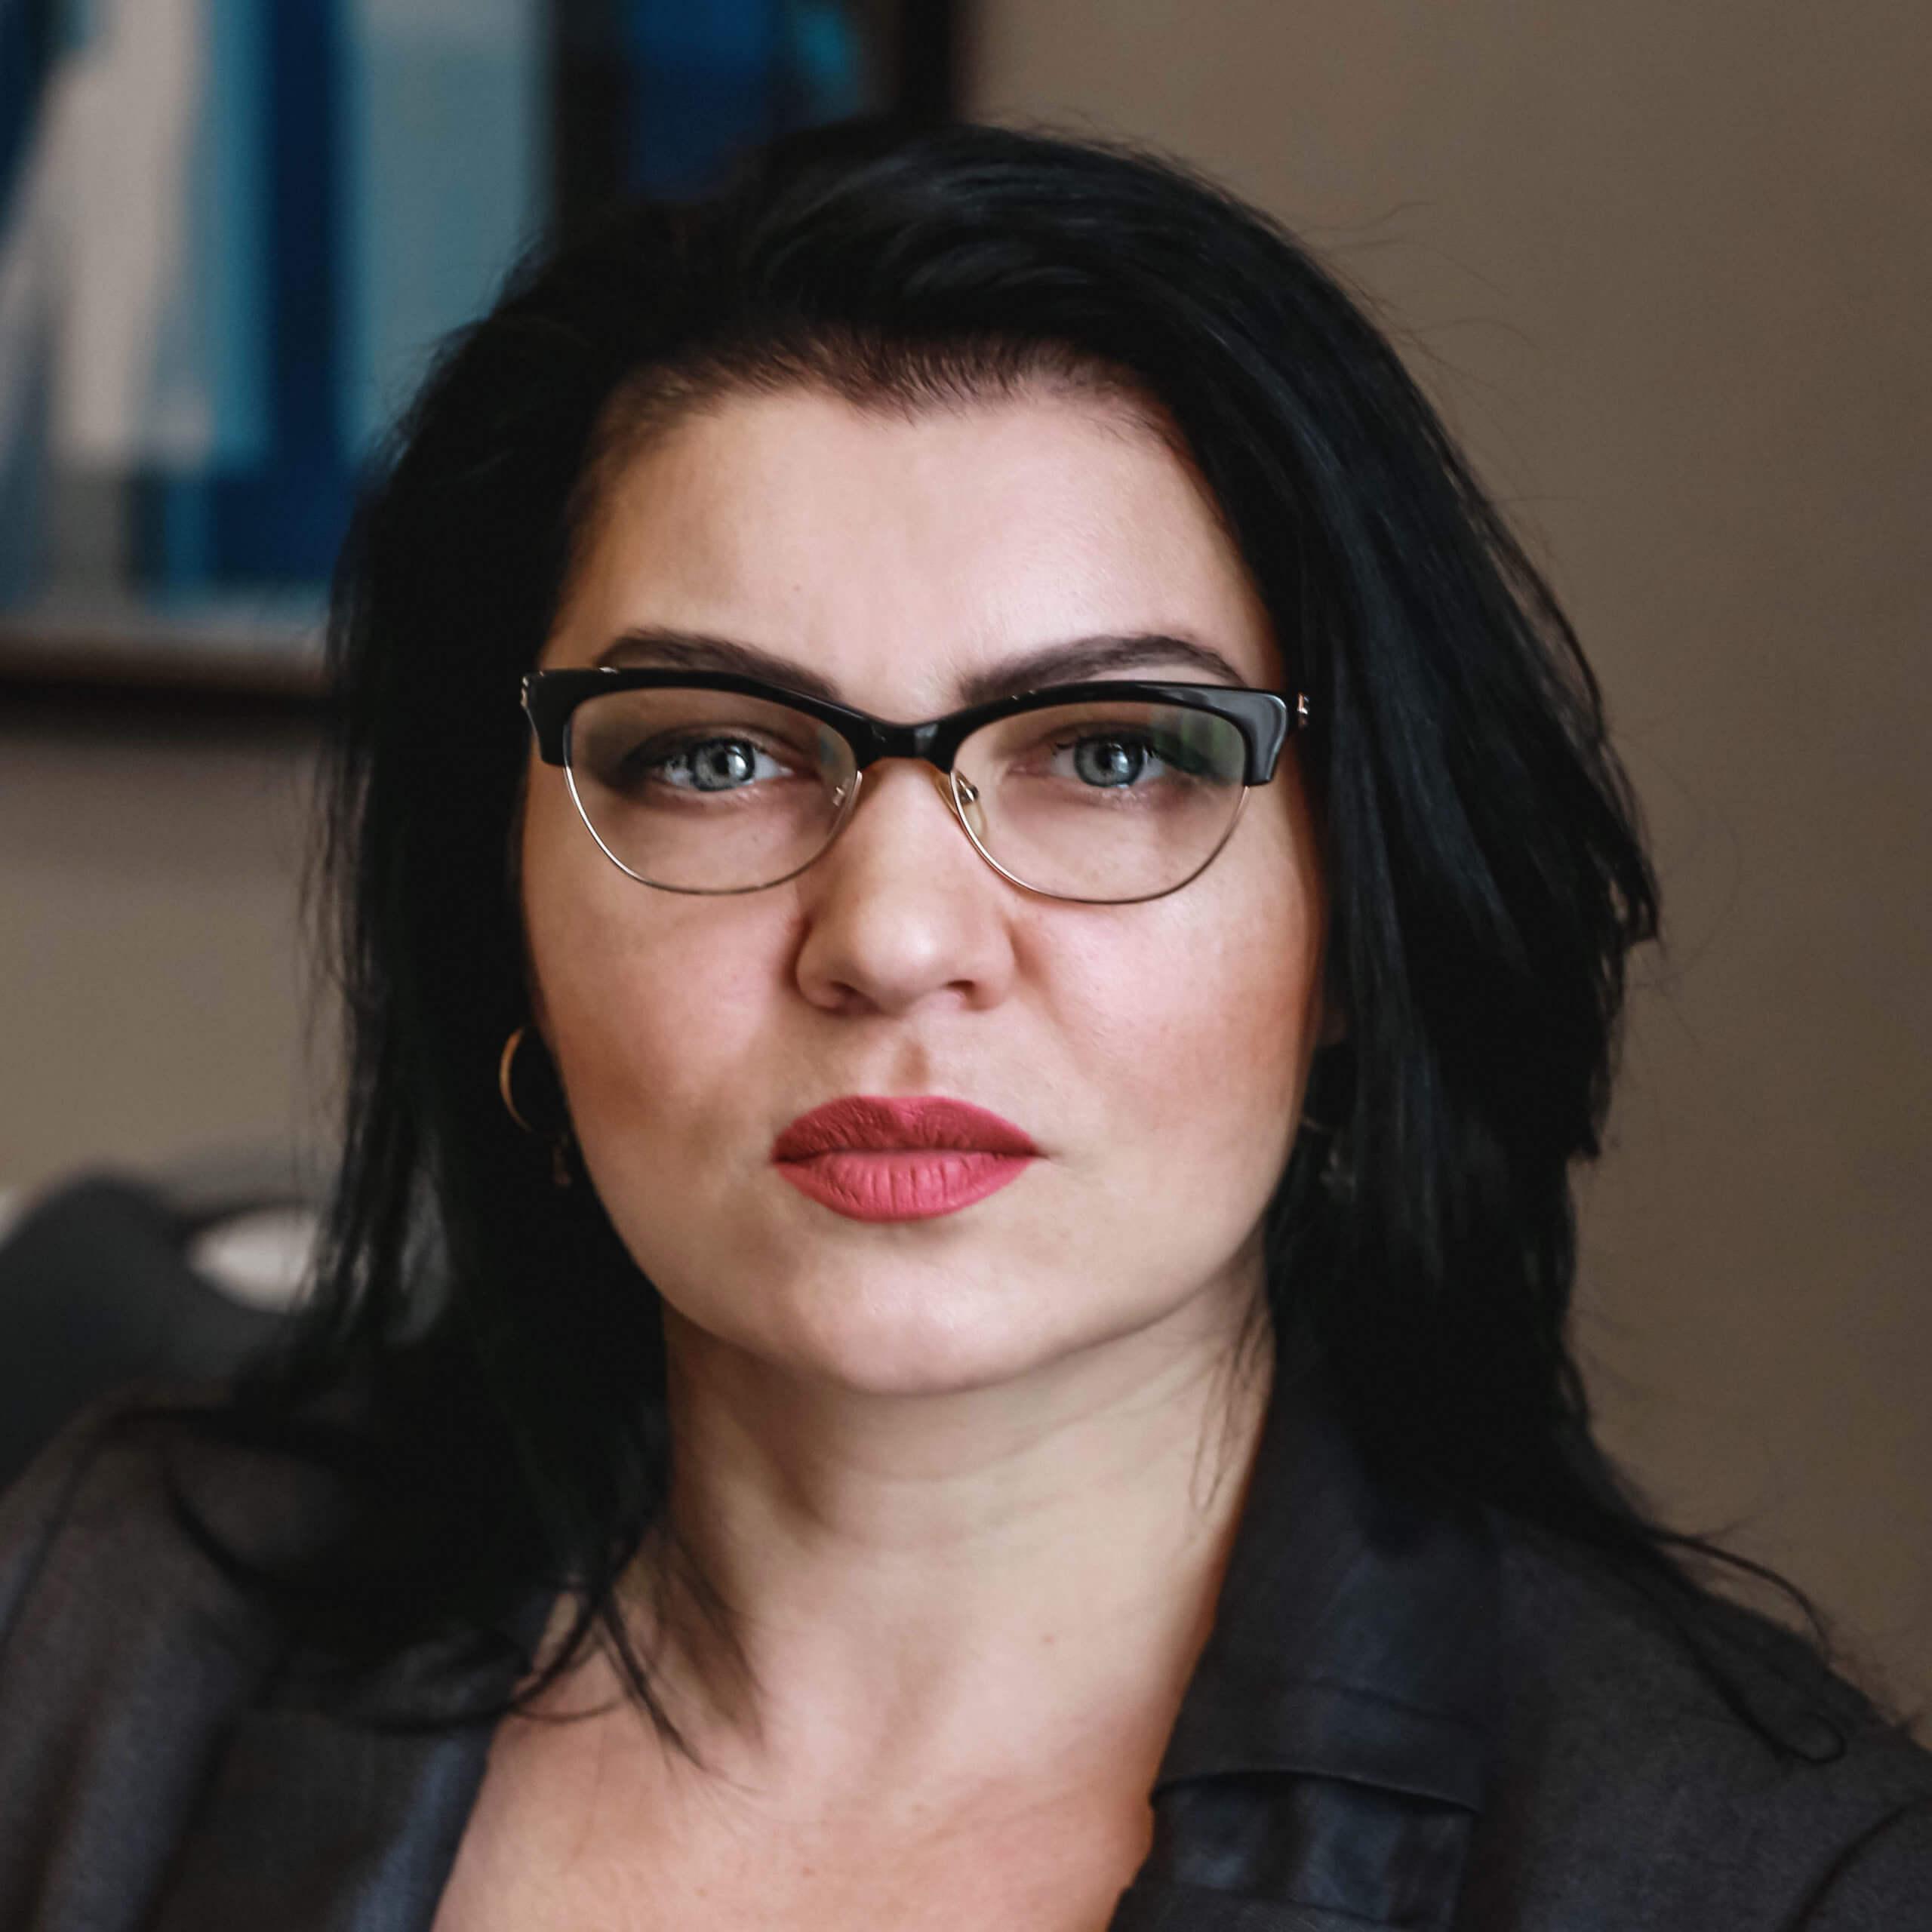 Нарваткина Марина Николаевна